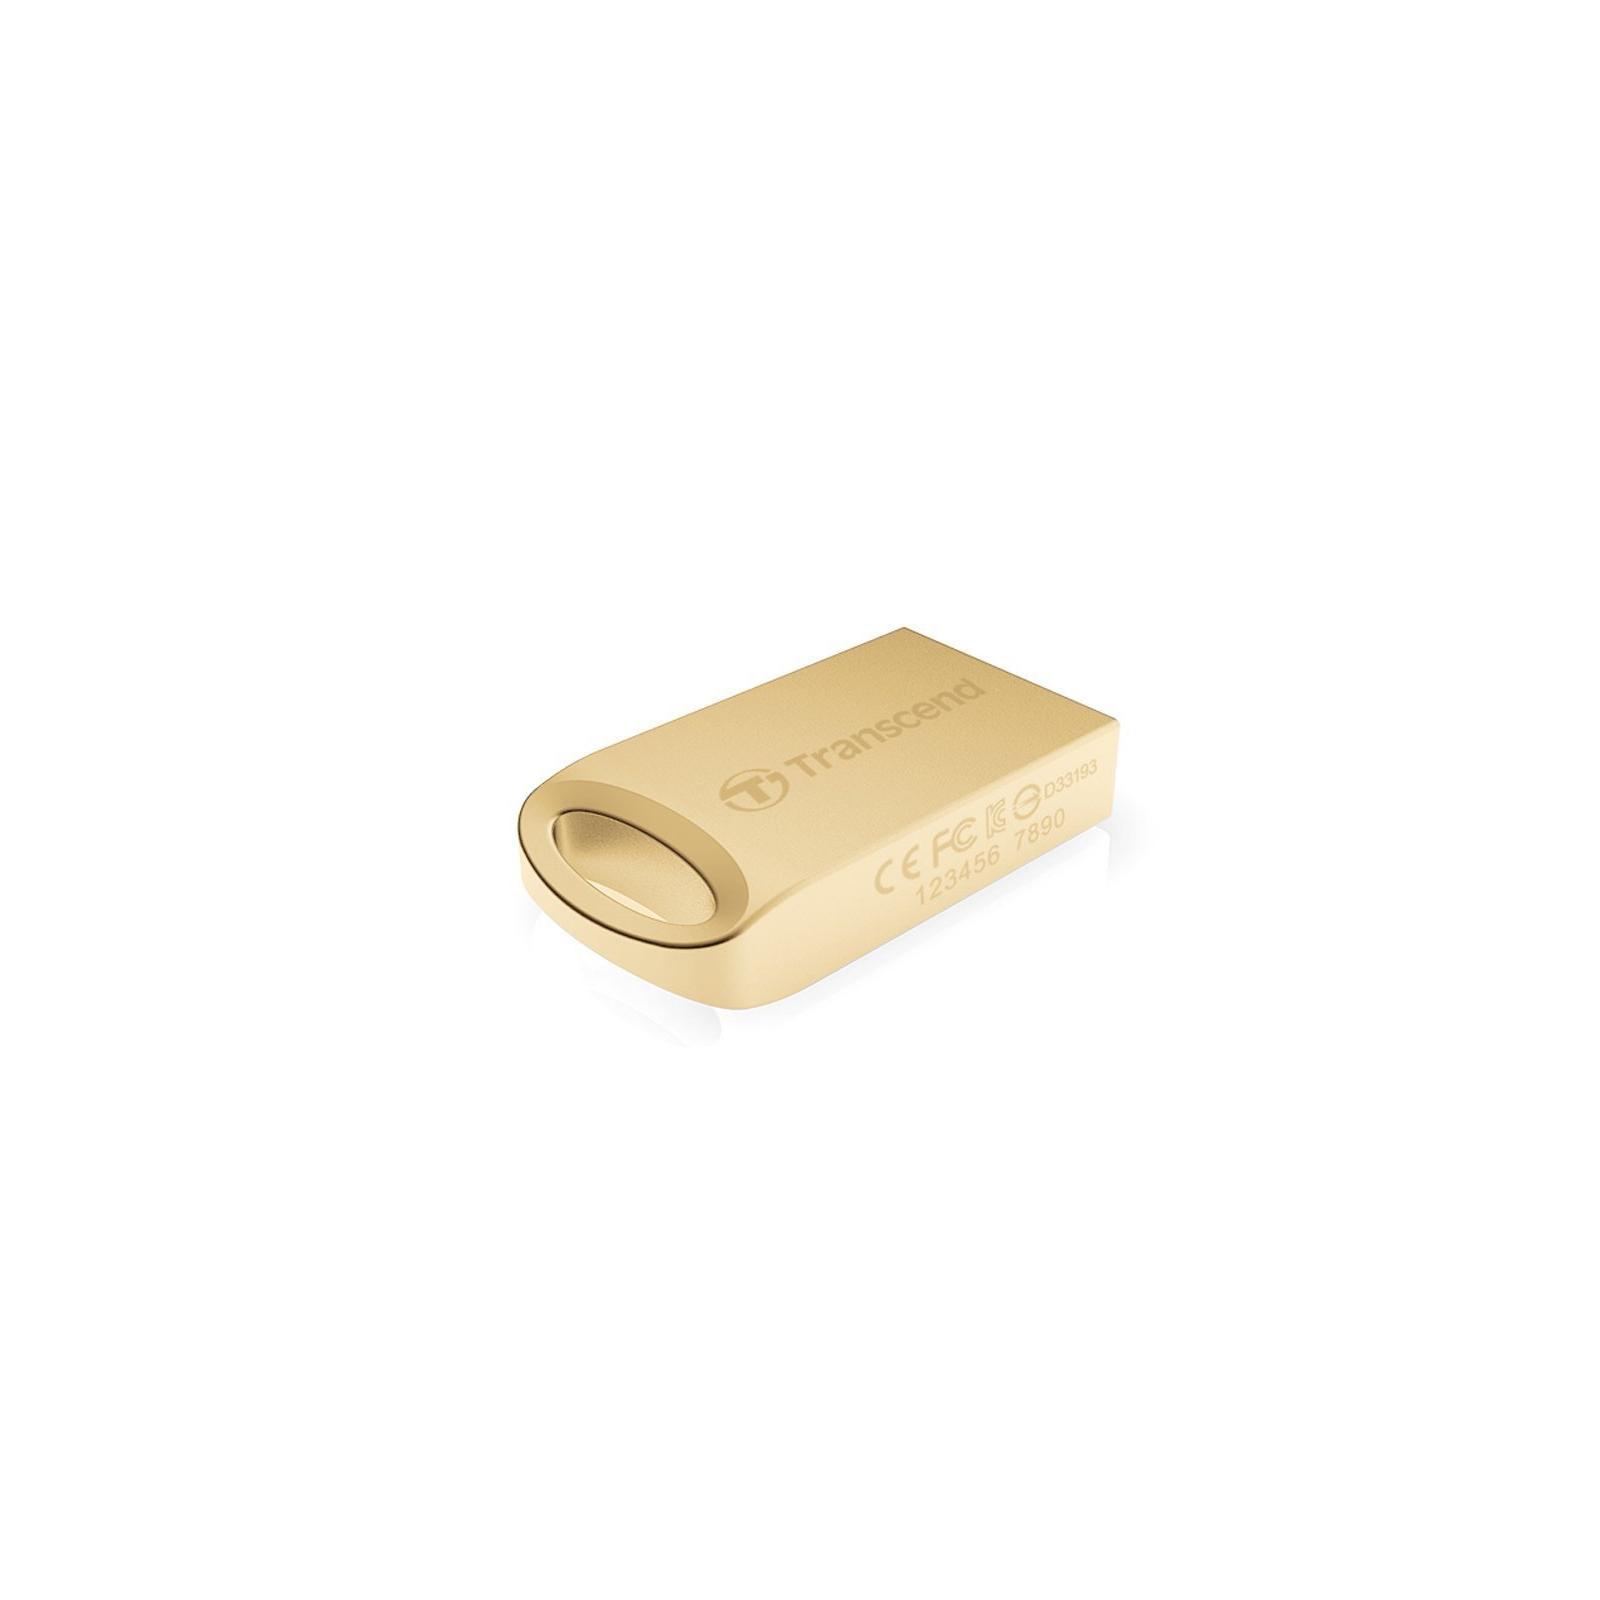 USB флеш накопитель Transcend JetFlash 510, Gold Plating (TS16GJF510G) изображение 3